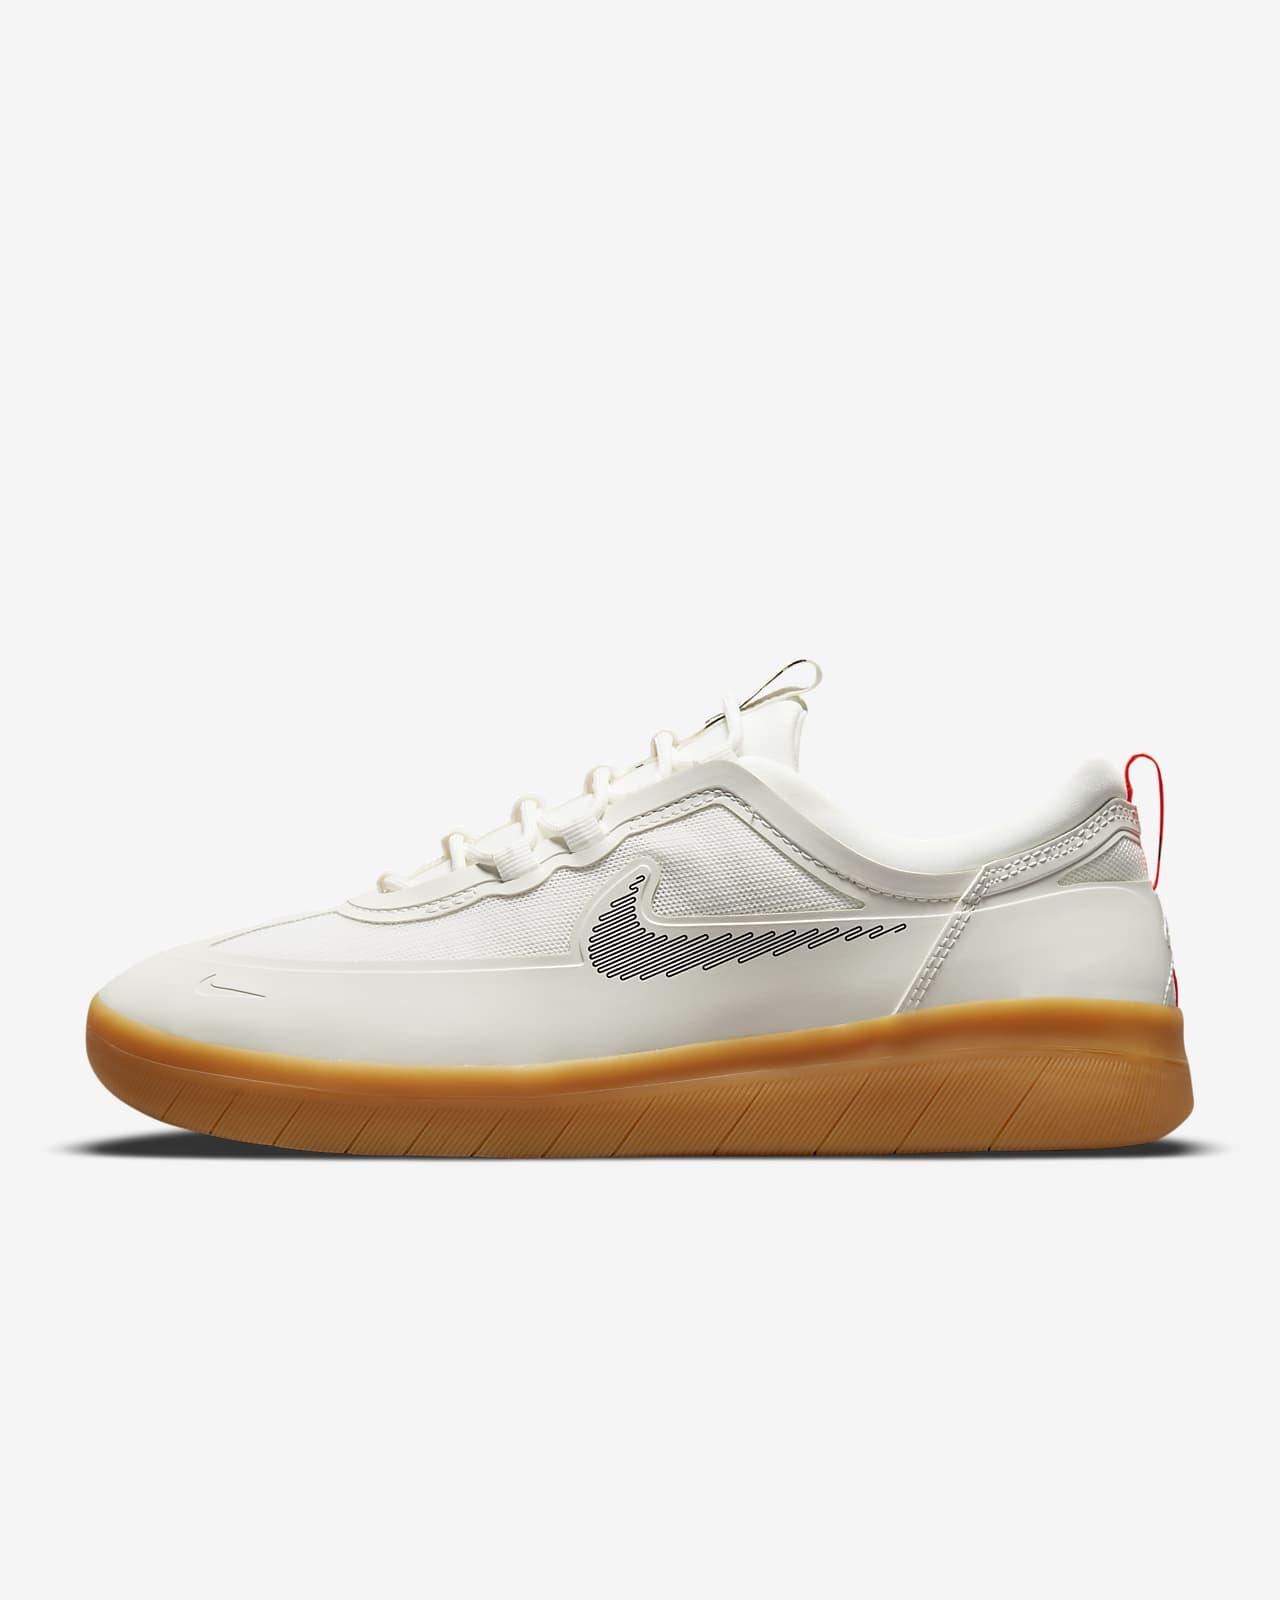 Chaussure de skateboard Nike SB Nyjah Free 2